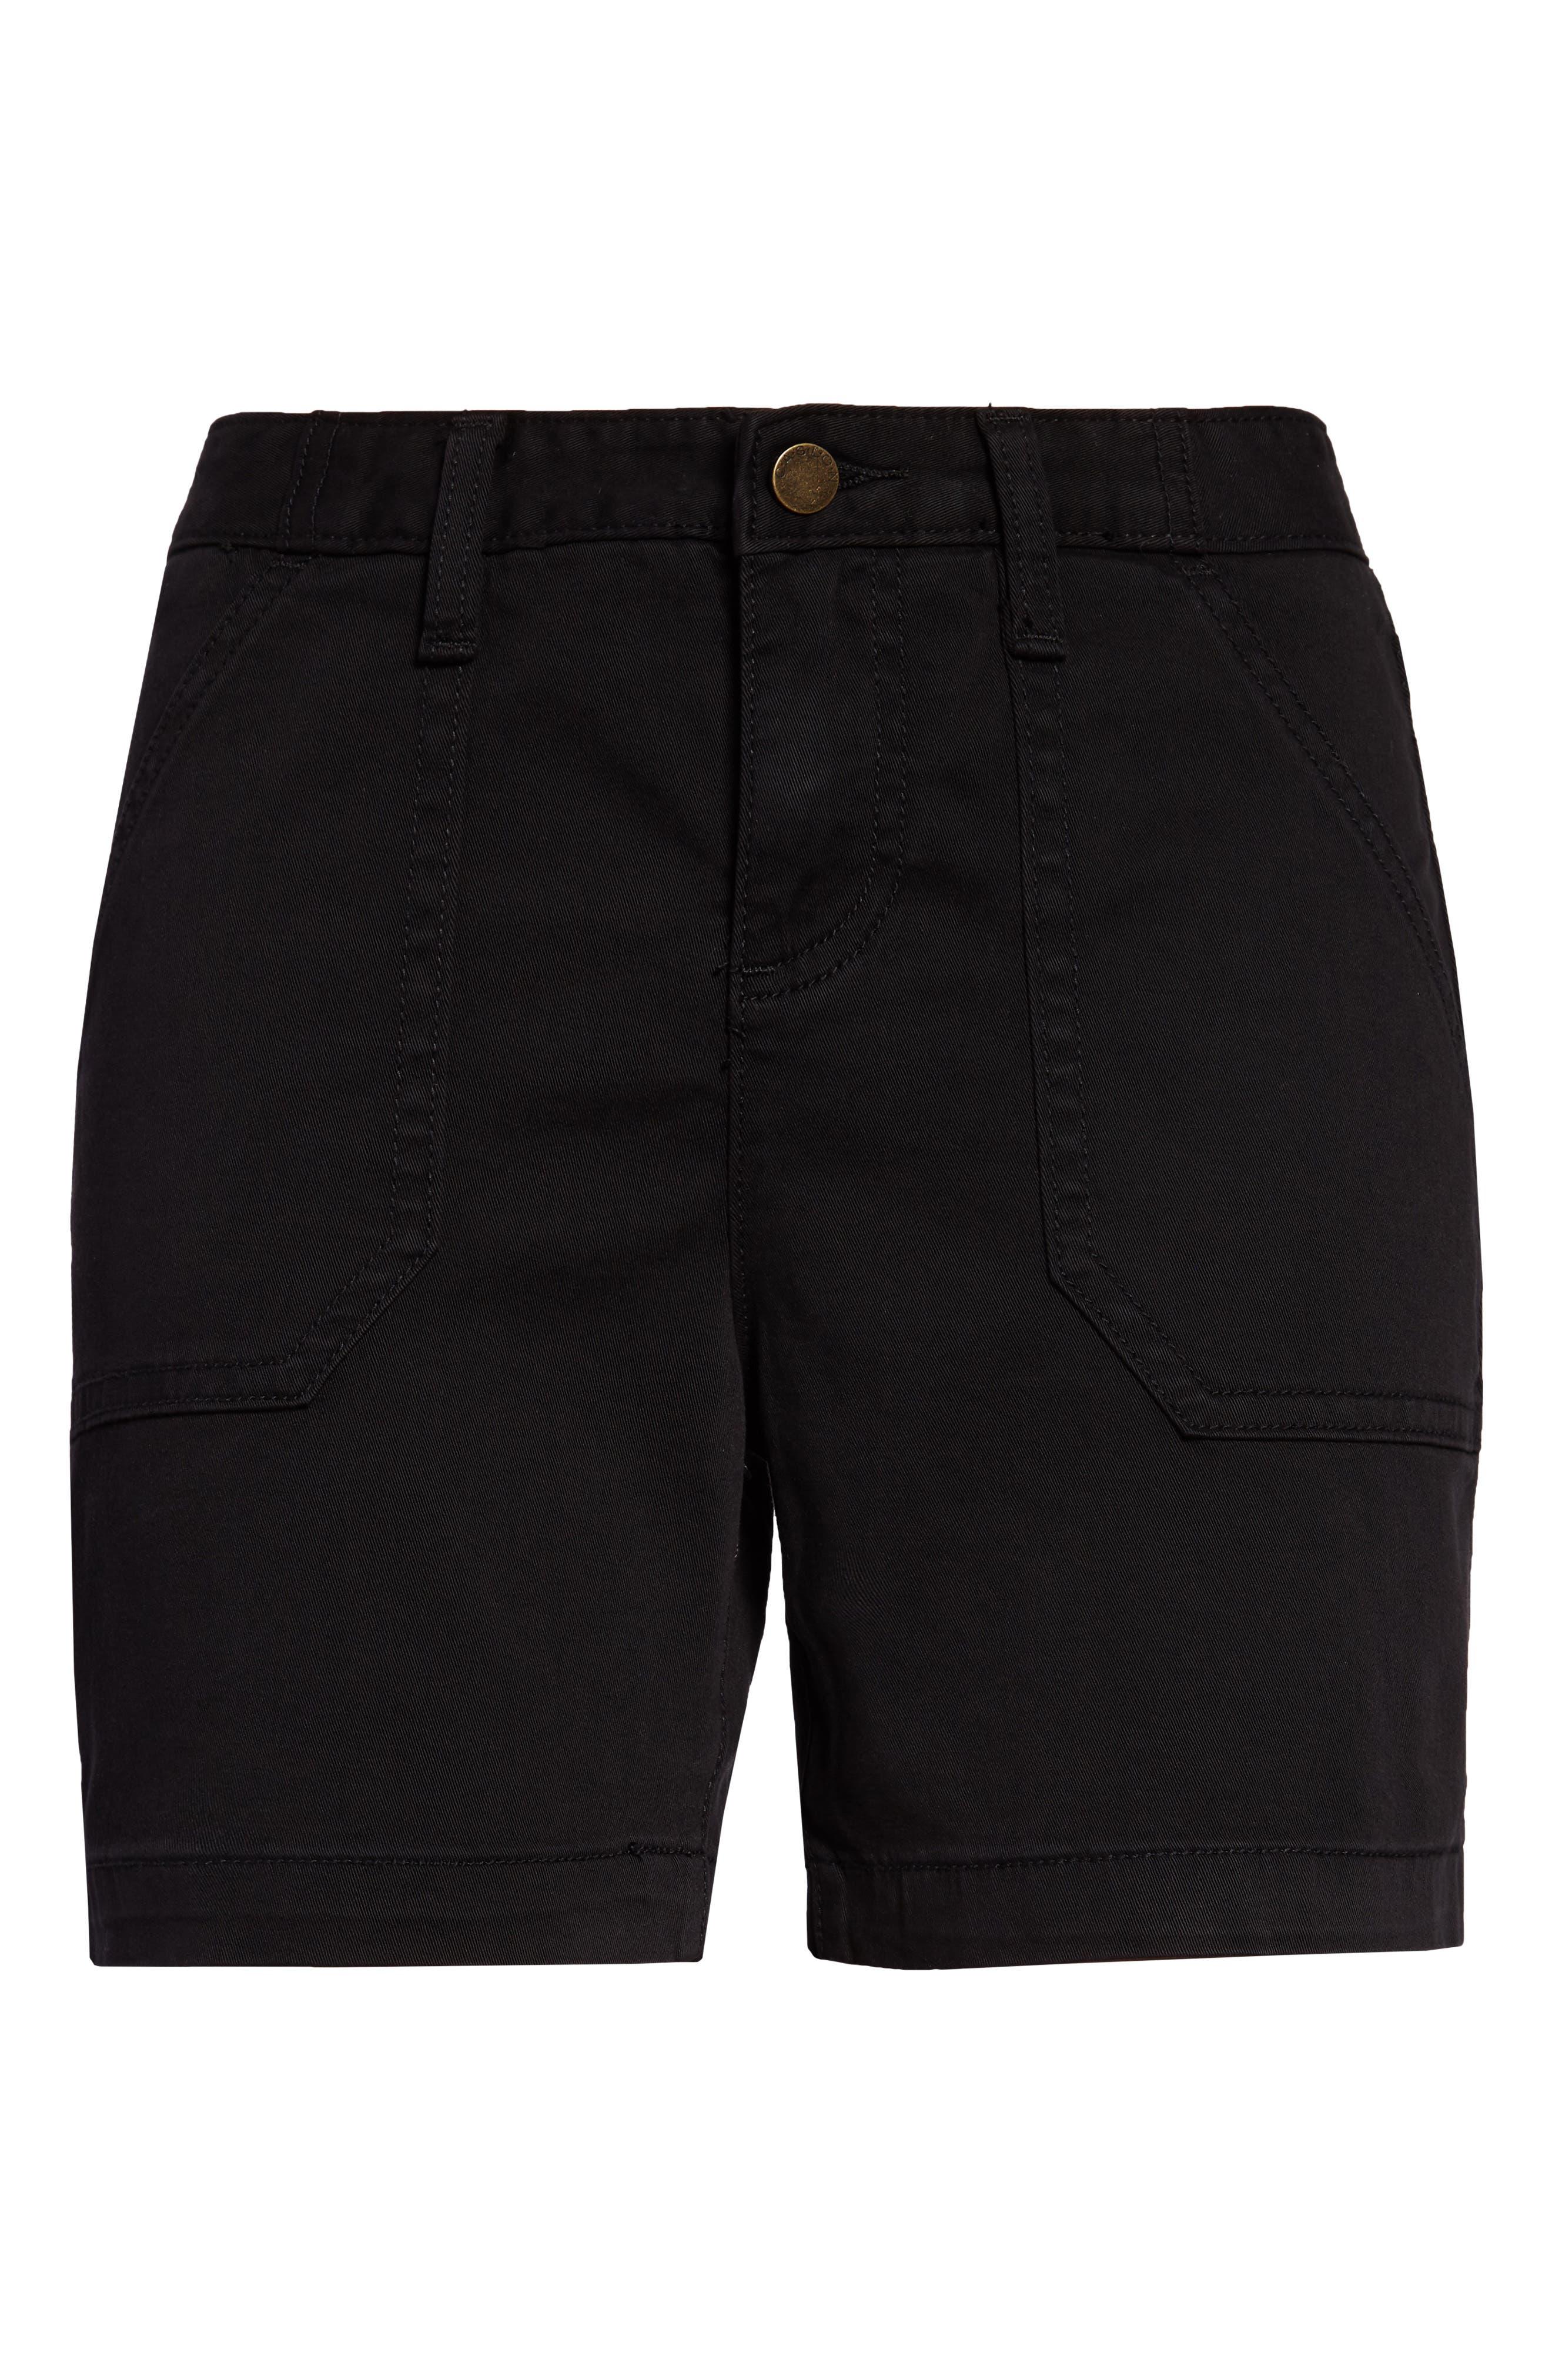 Utility Shorts,                             Alternate thumbnail 32, color,